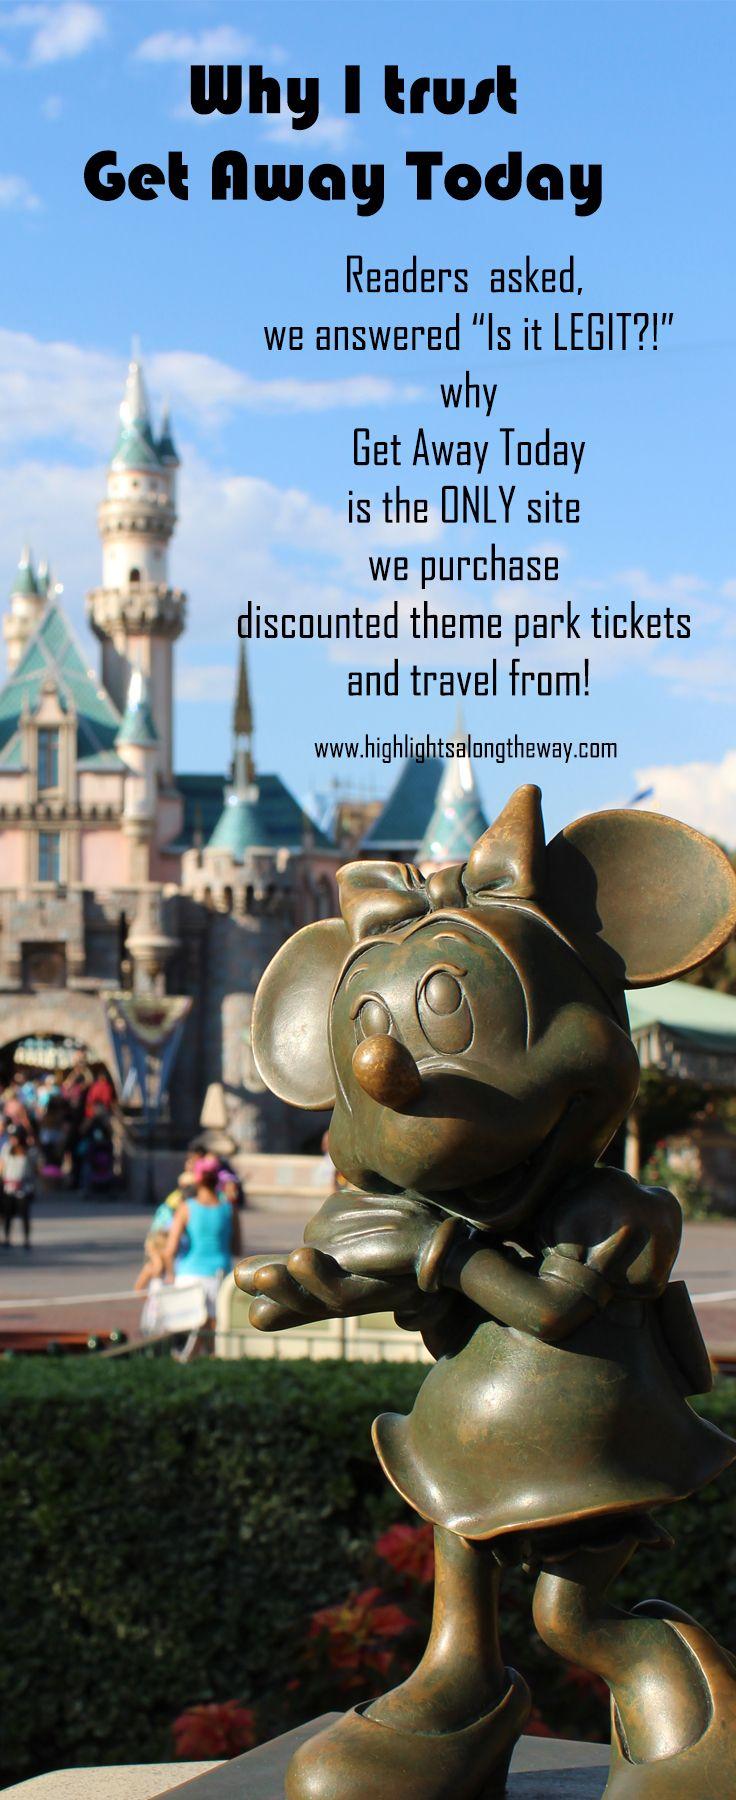 is get away today legit for discounted disneyland tickets? #disneyland #familytravel